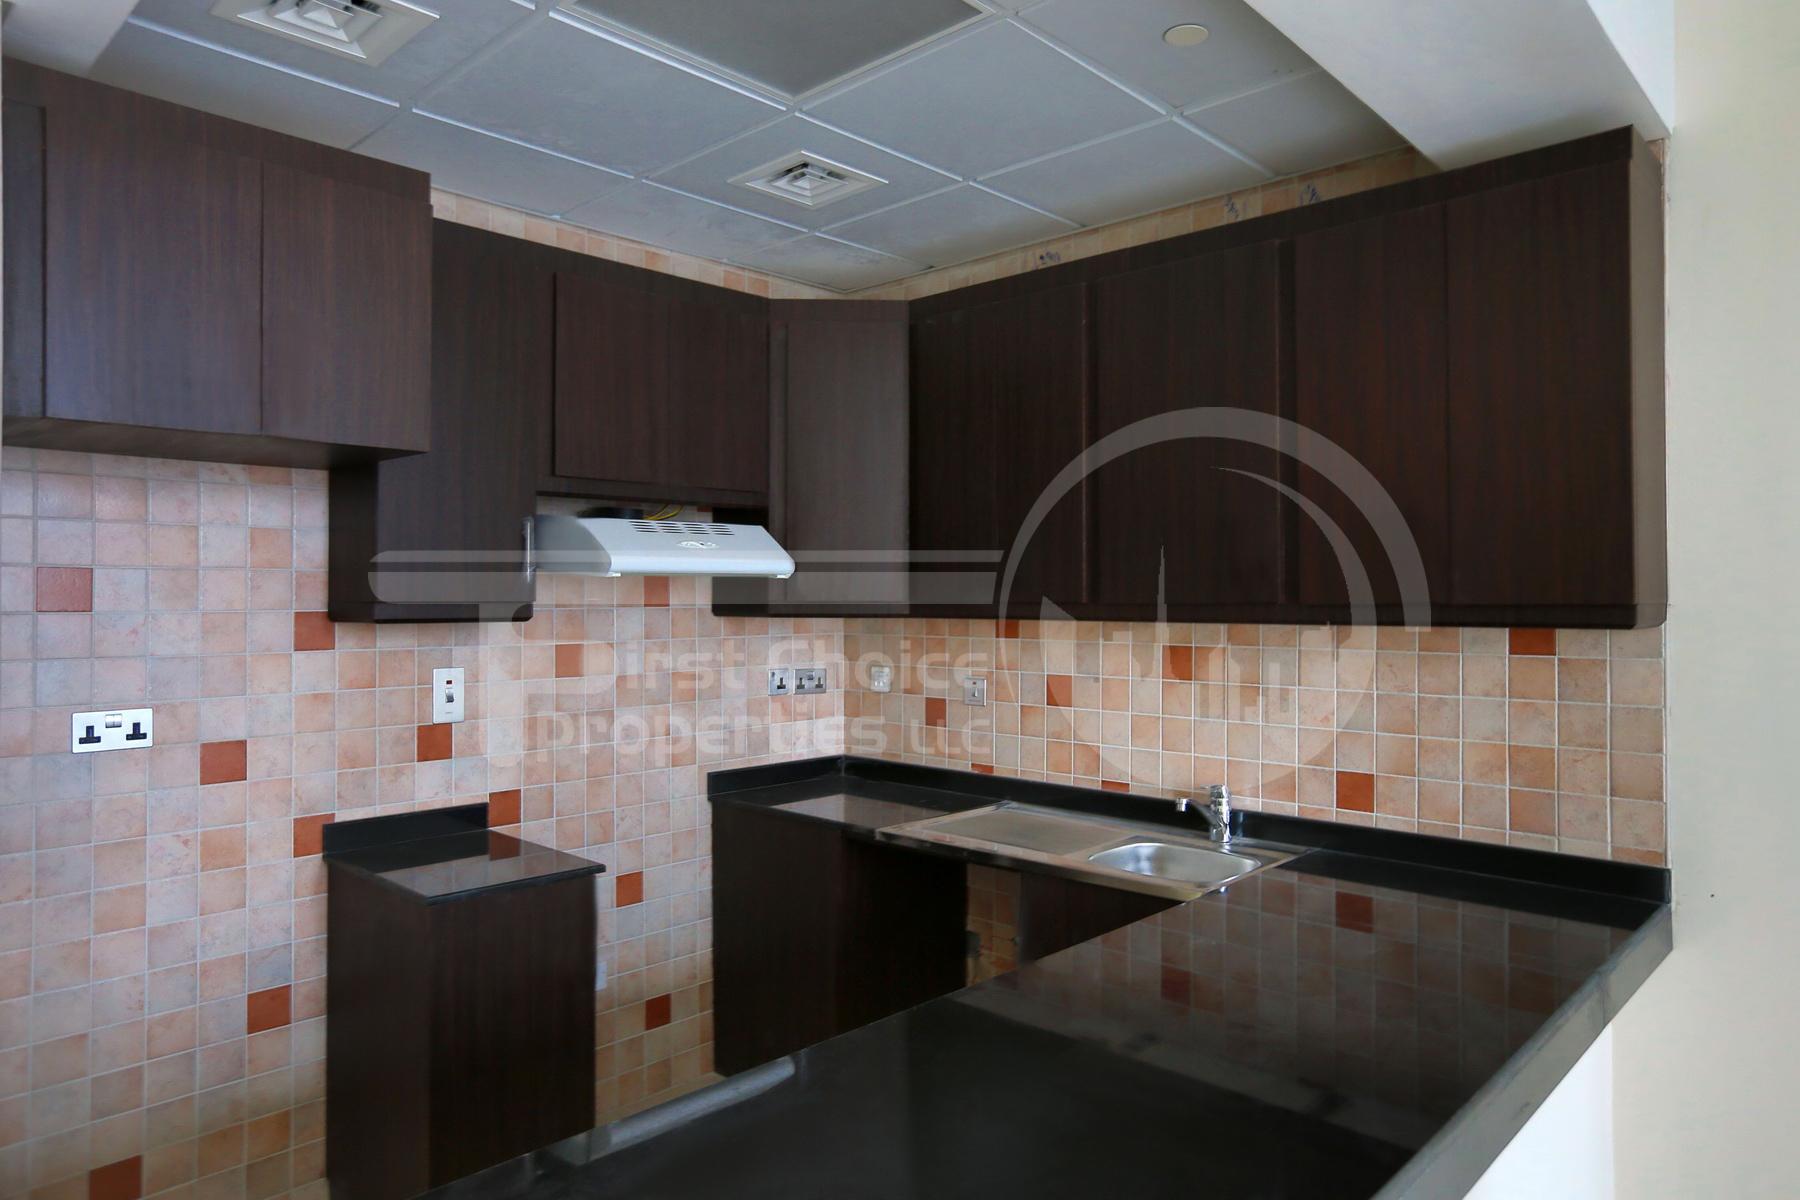 Studio Apartment - Abu Dhabi - UAE - Al Reem Island - Hydra Avenue (9).JPG